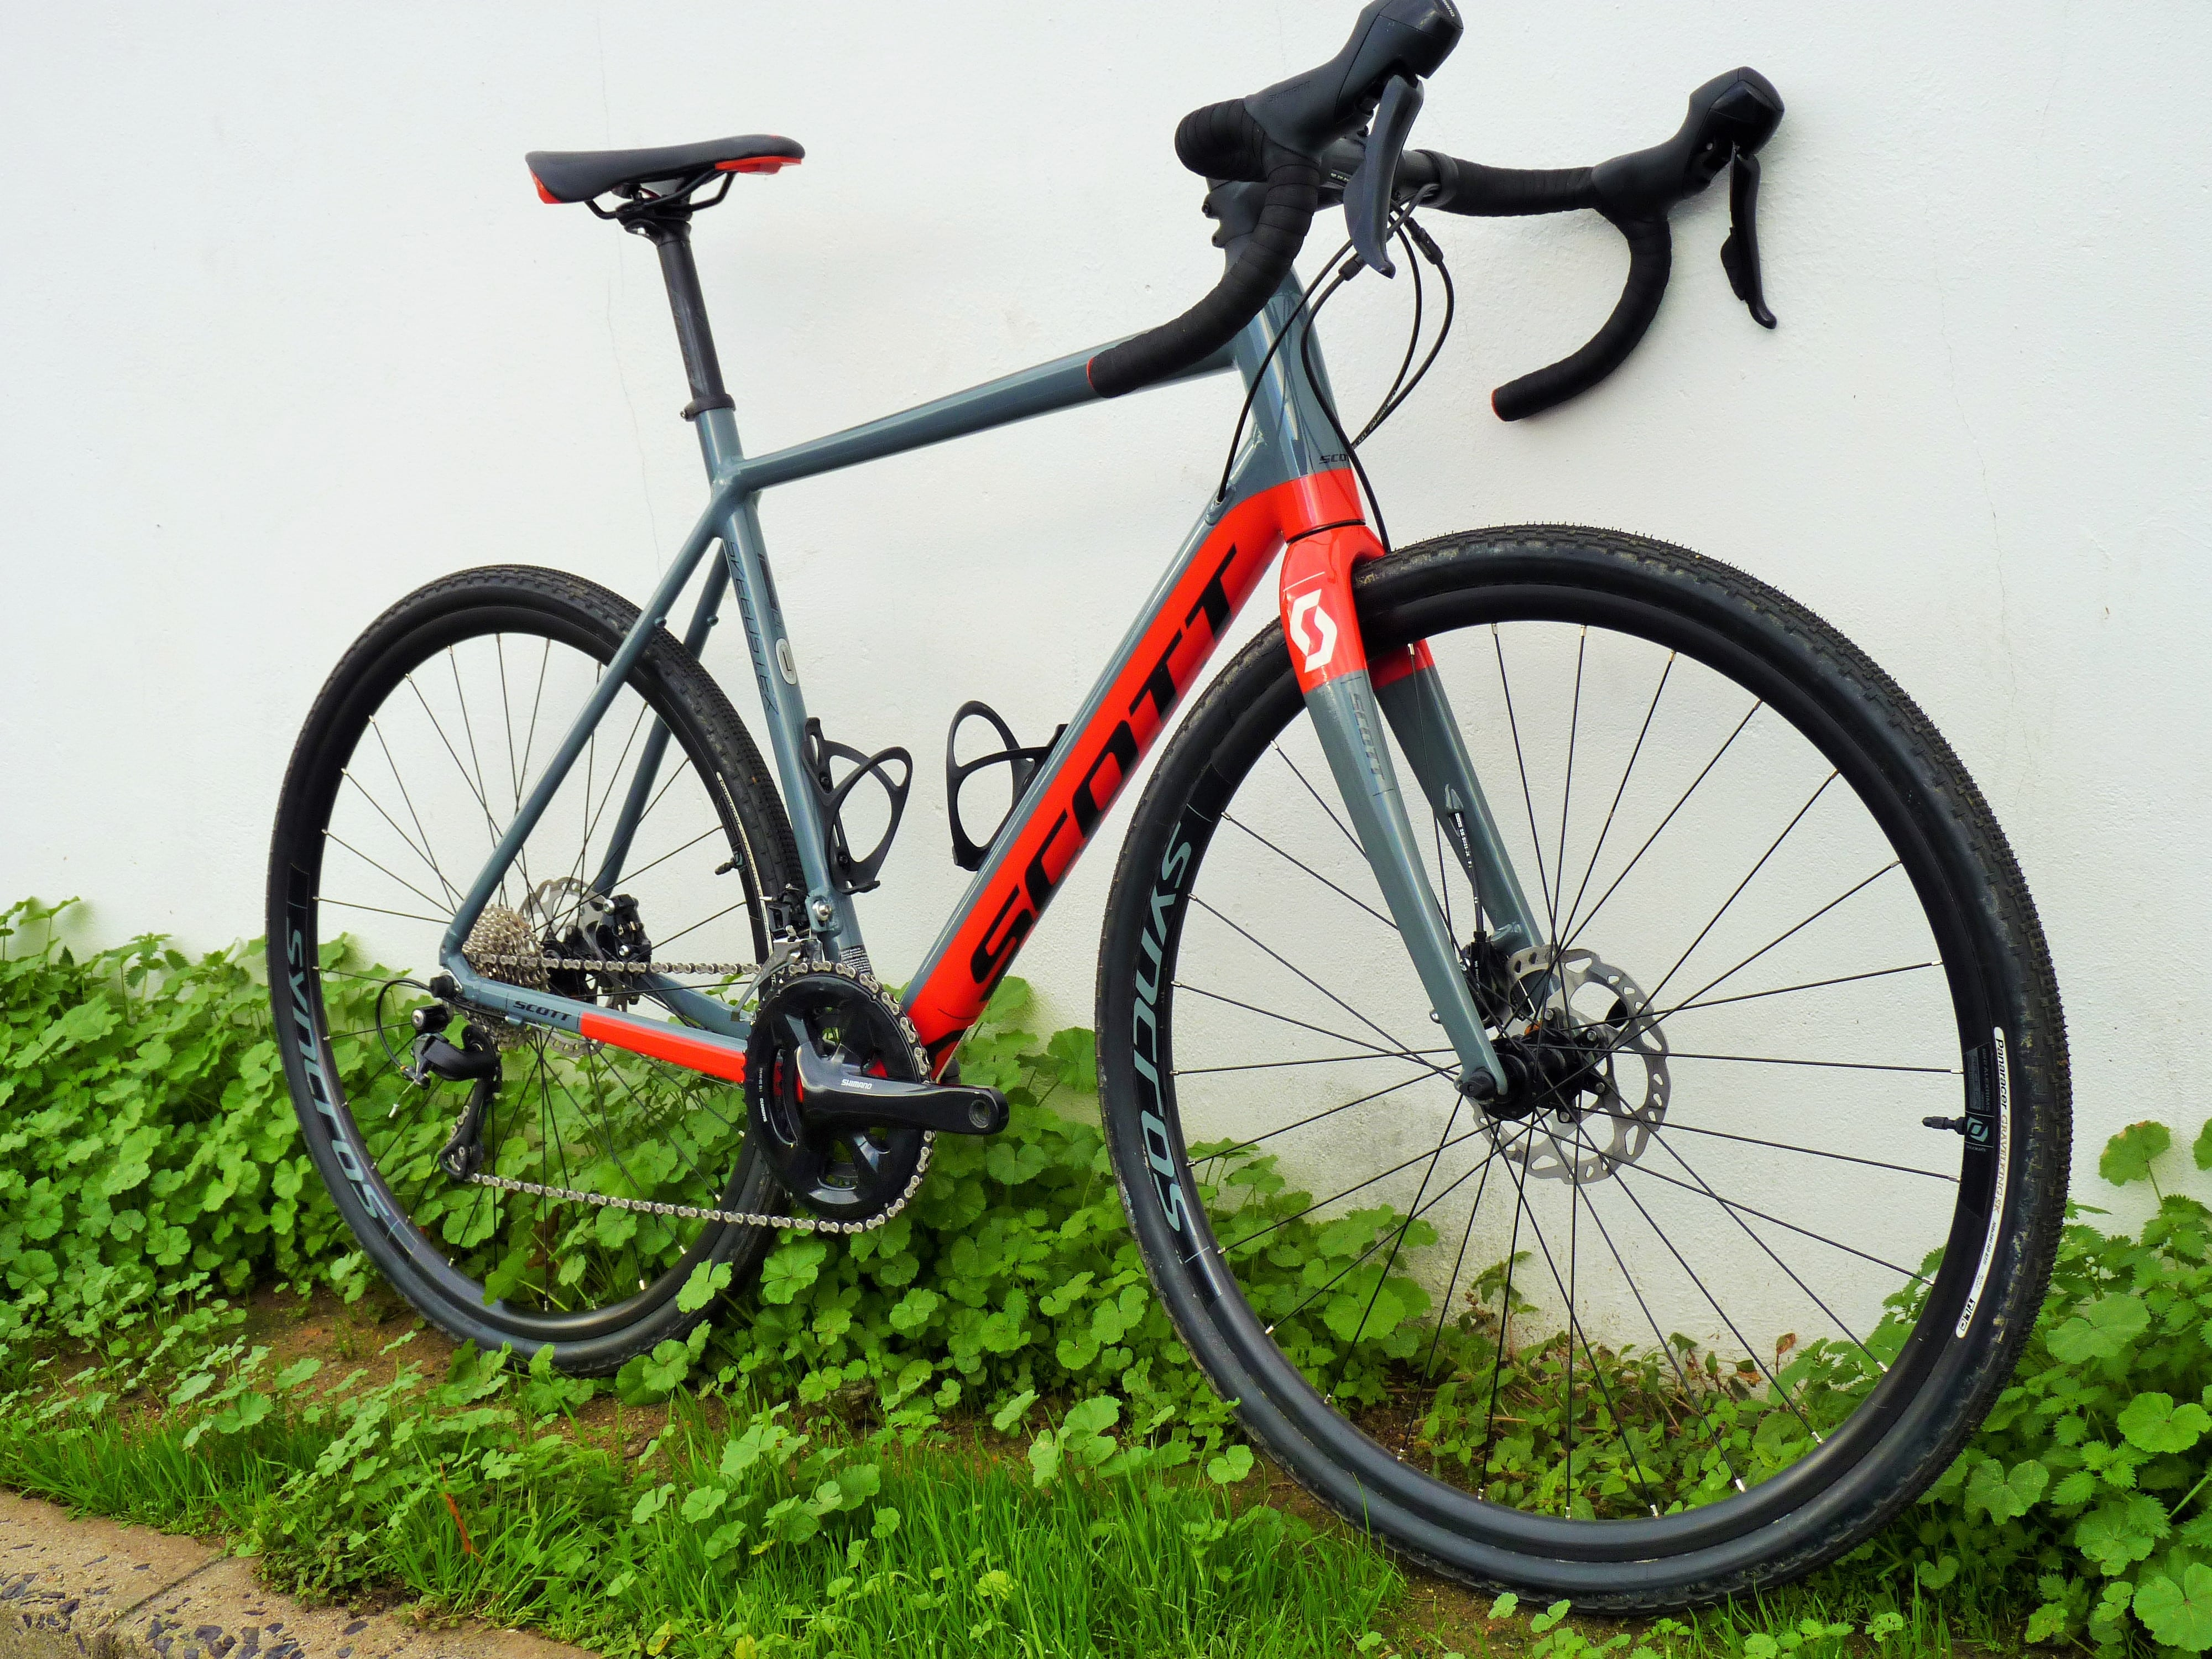 2018 scott speedster gravel 10 review the swiss trailblazer spark bike. Black Bedroom Furniture Sets. Home Design Ideas